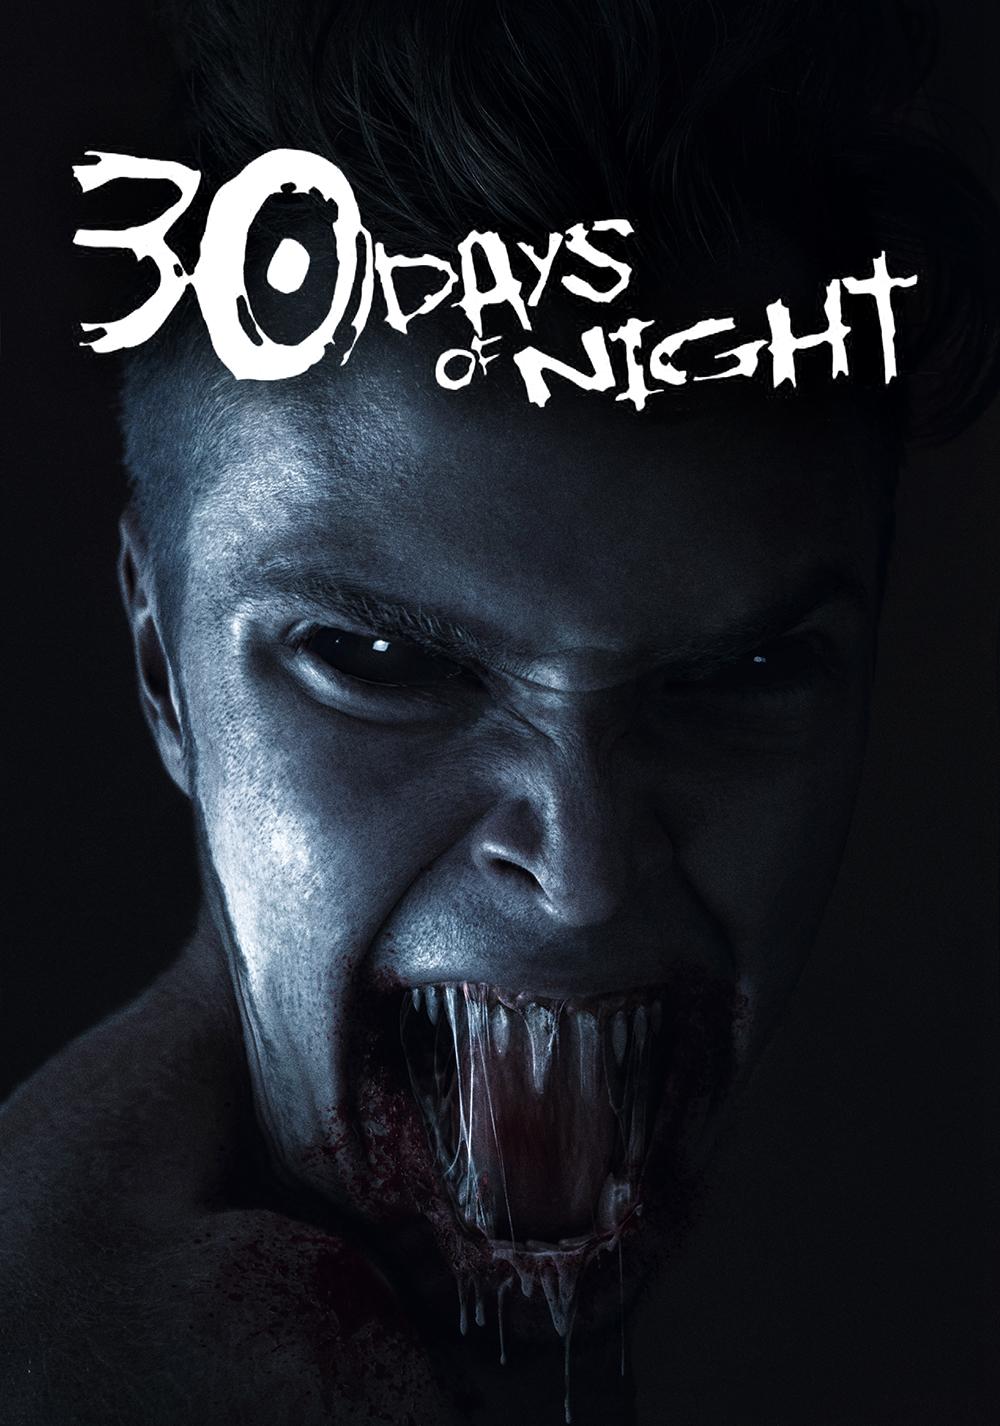 30 Days of Night | Movie fanart | fanart.tv